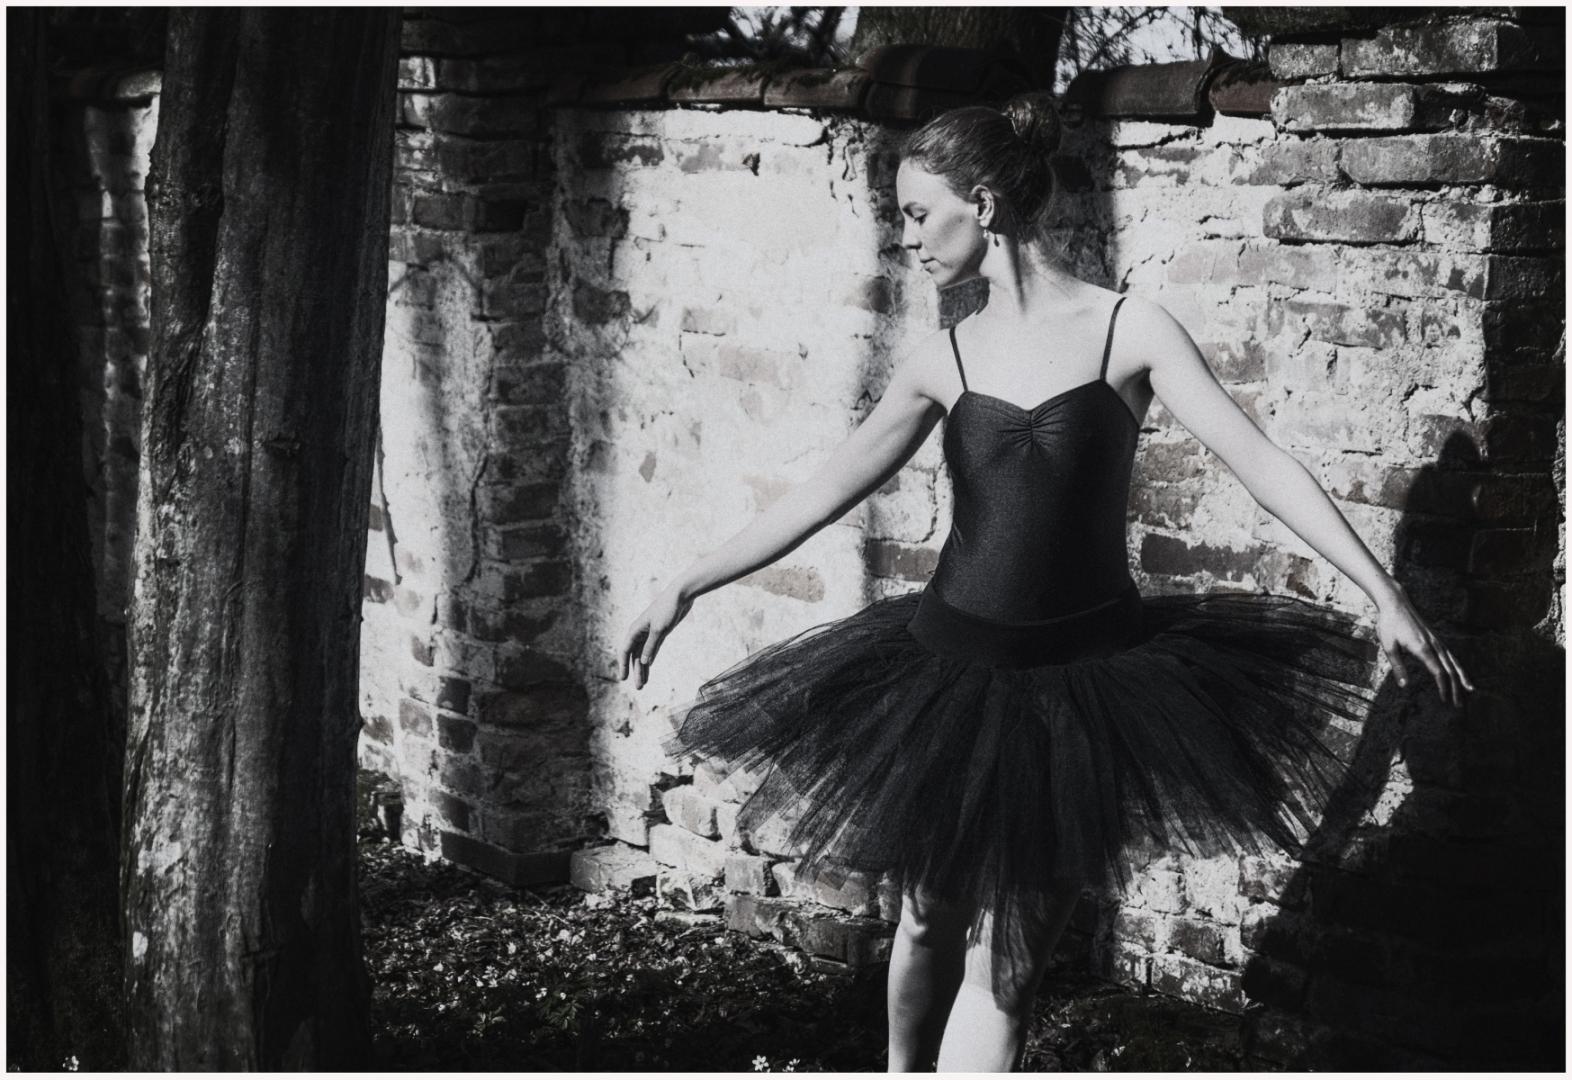 130-sw-Ballett-250317